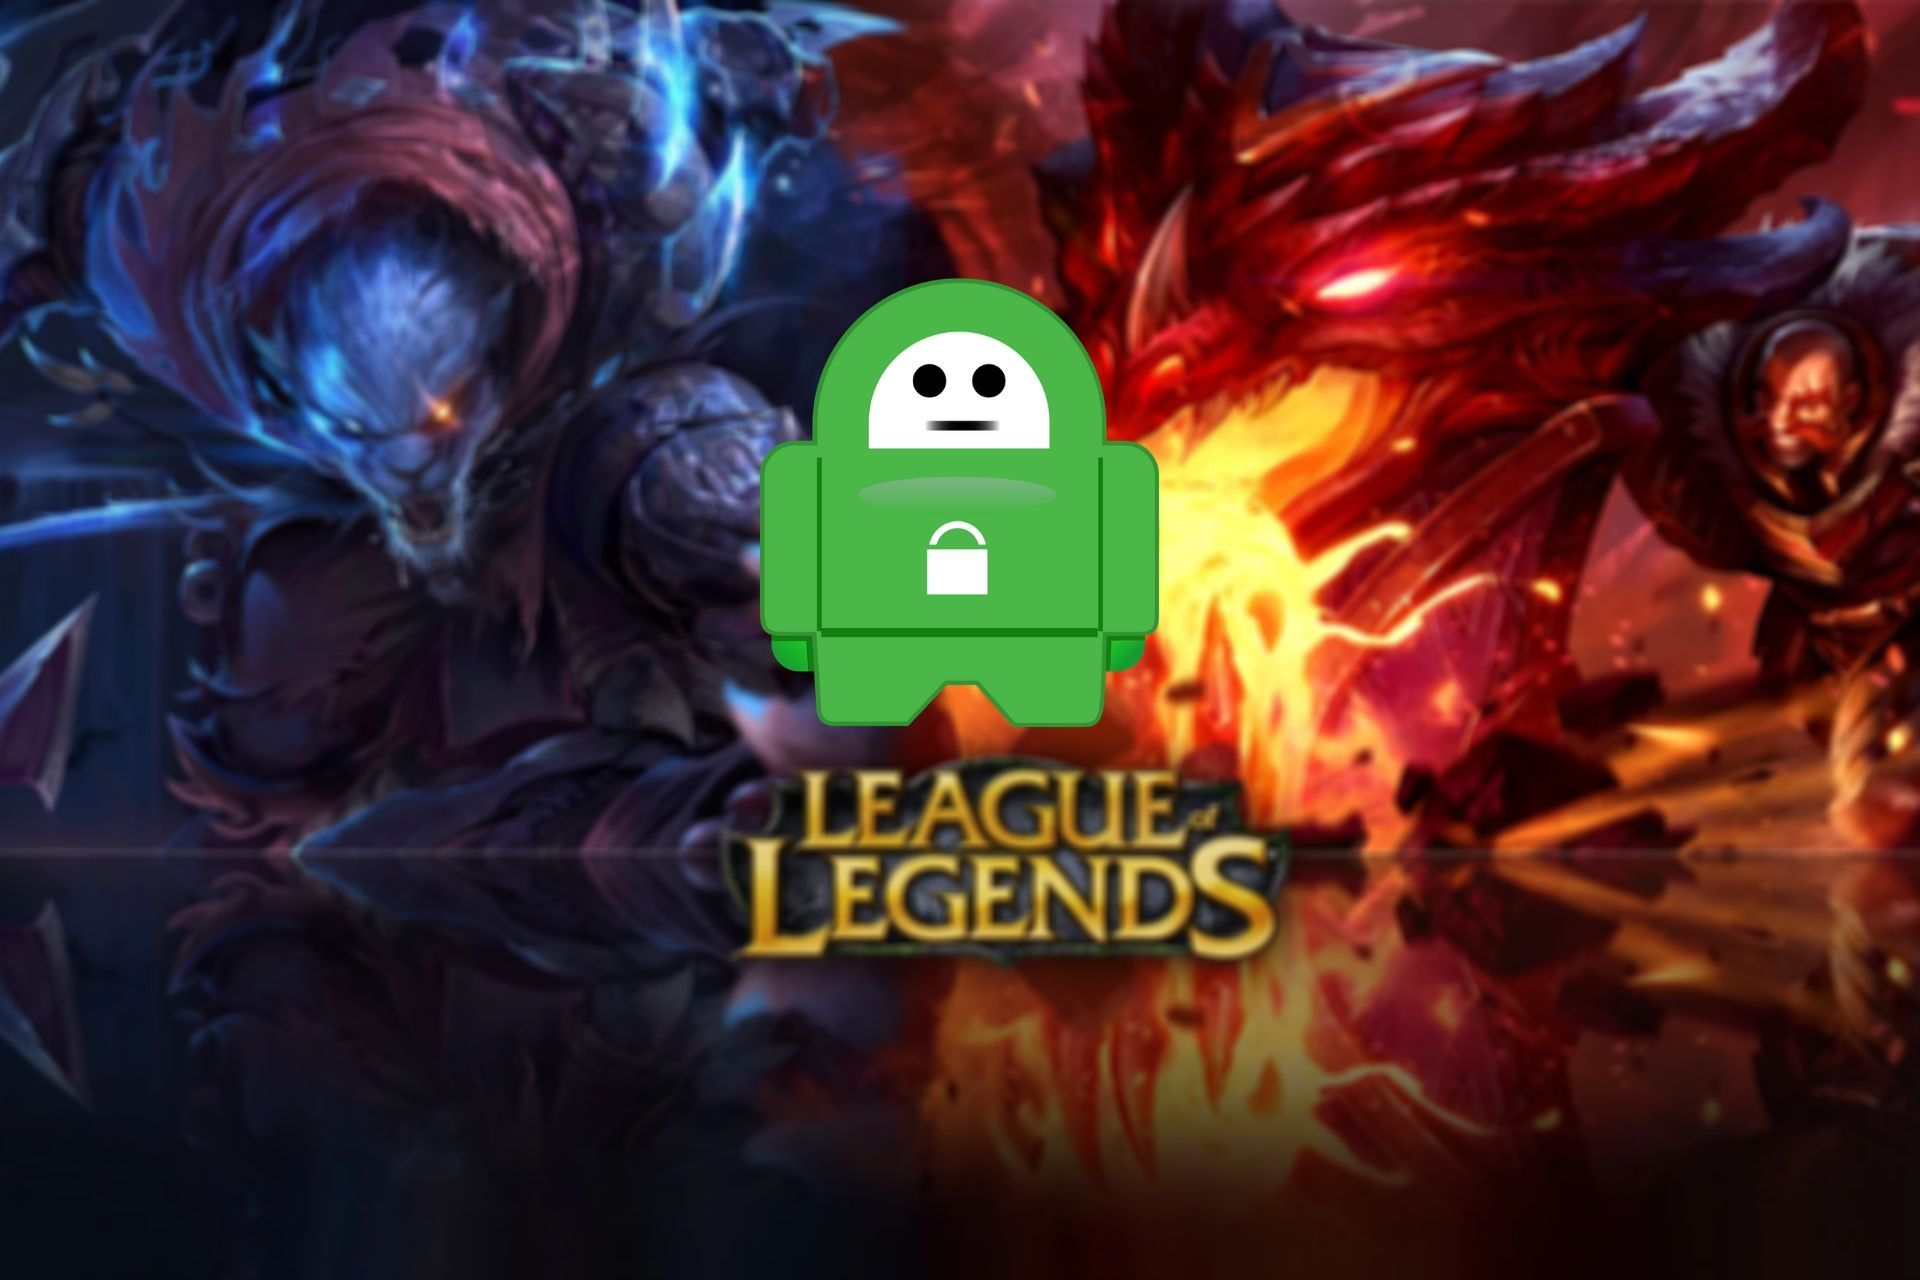 a1255fc4c96bd4973ece600d8d987a9e - Using Vpn For League Of Legends